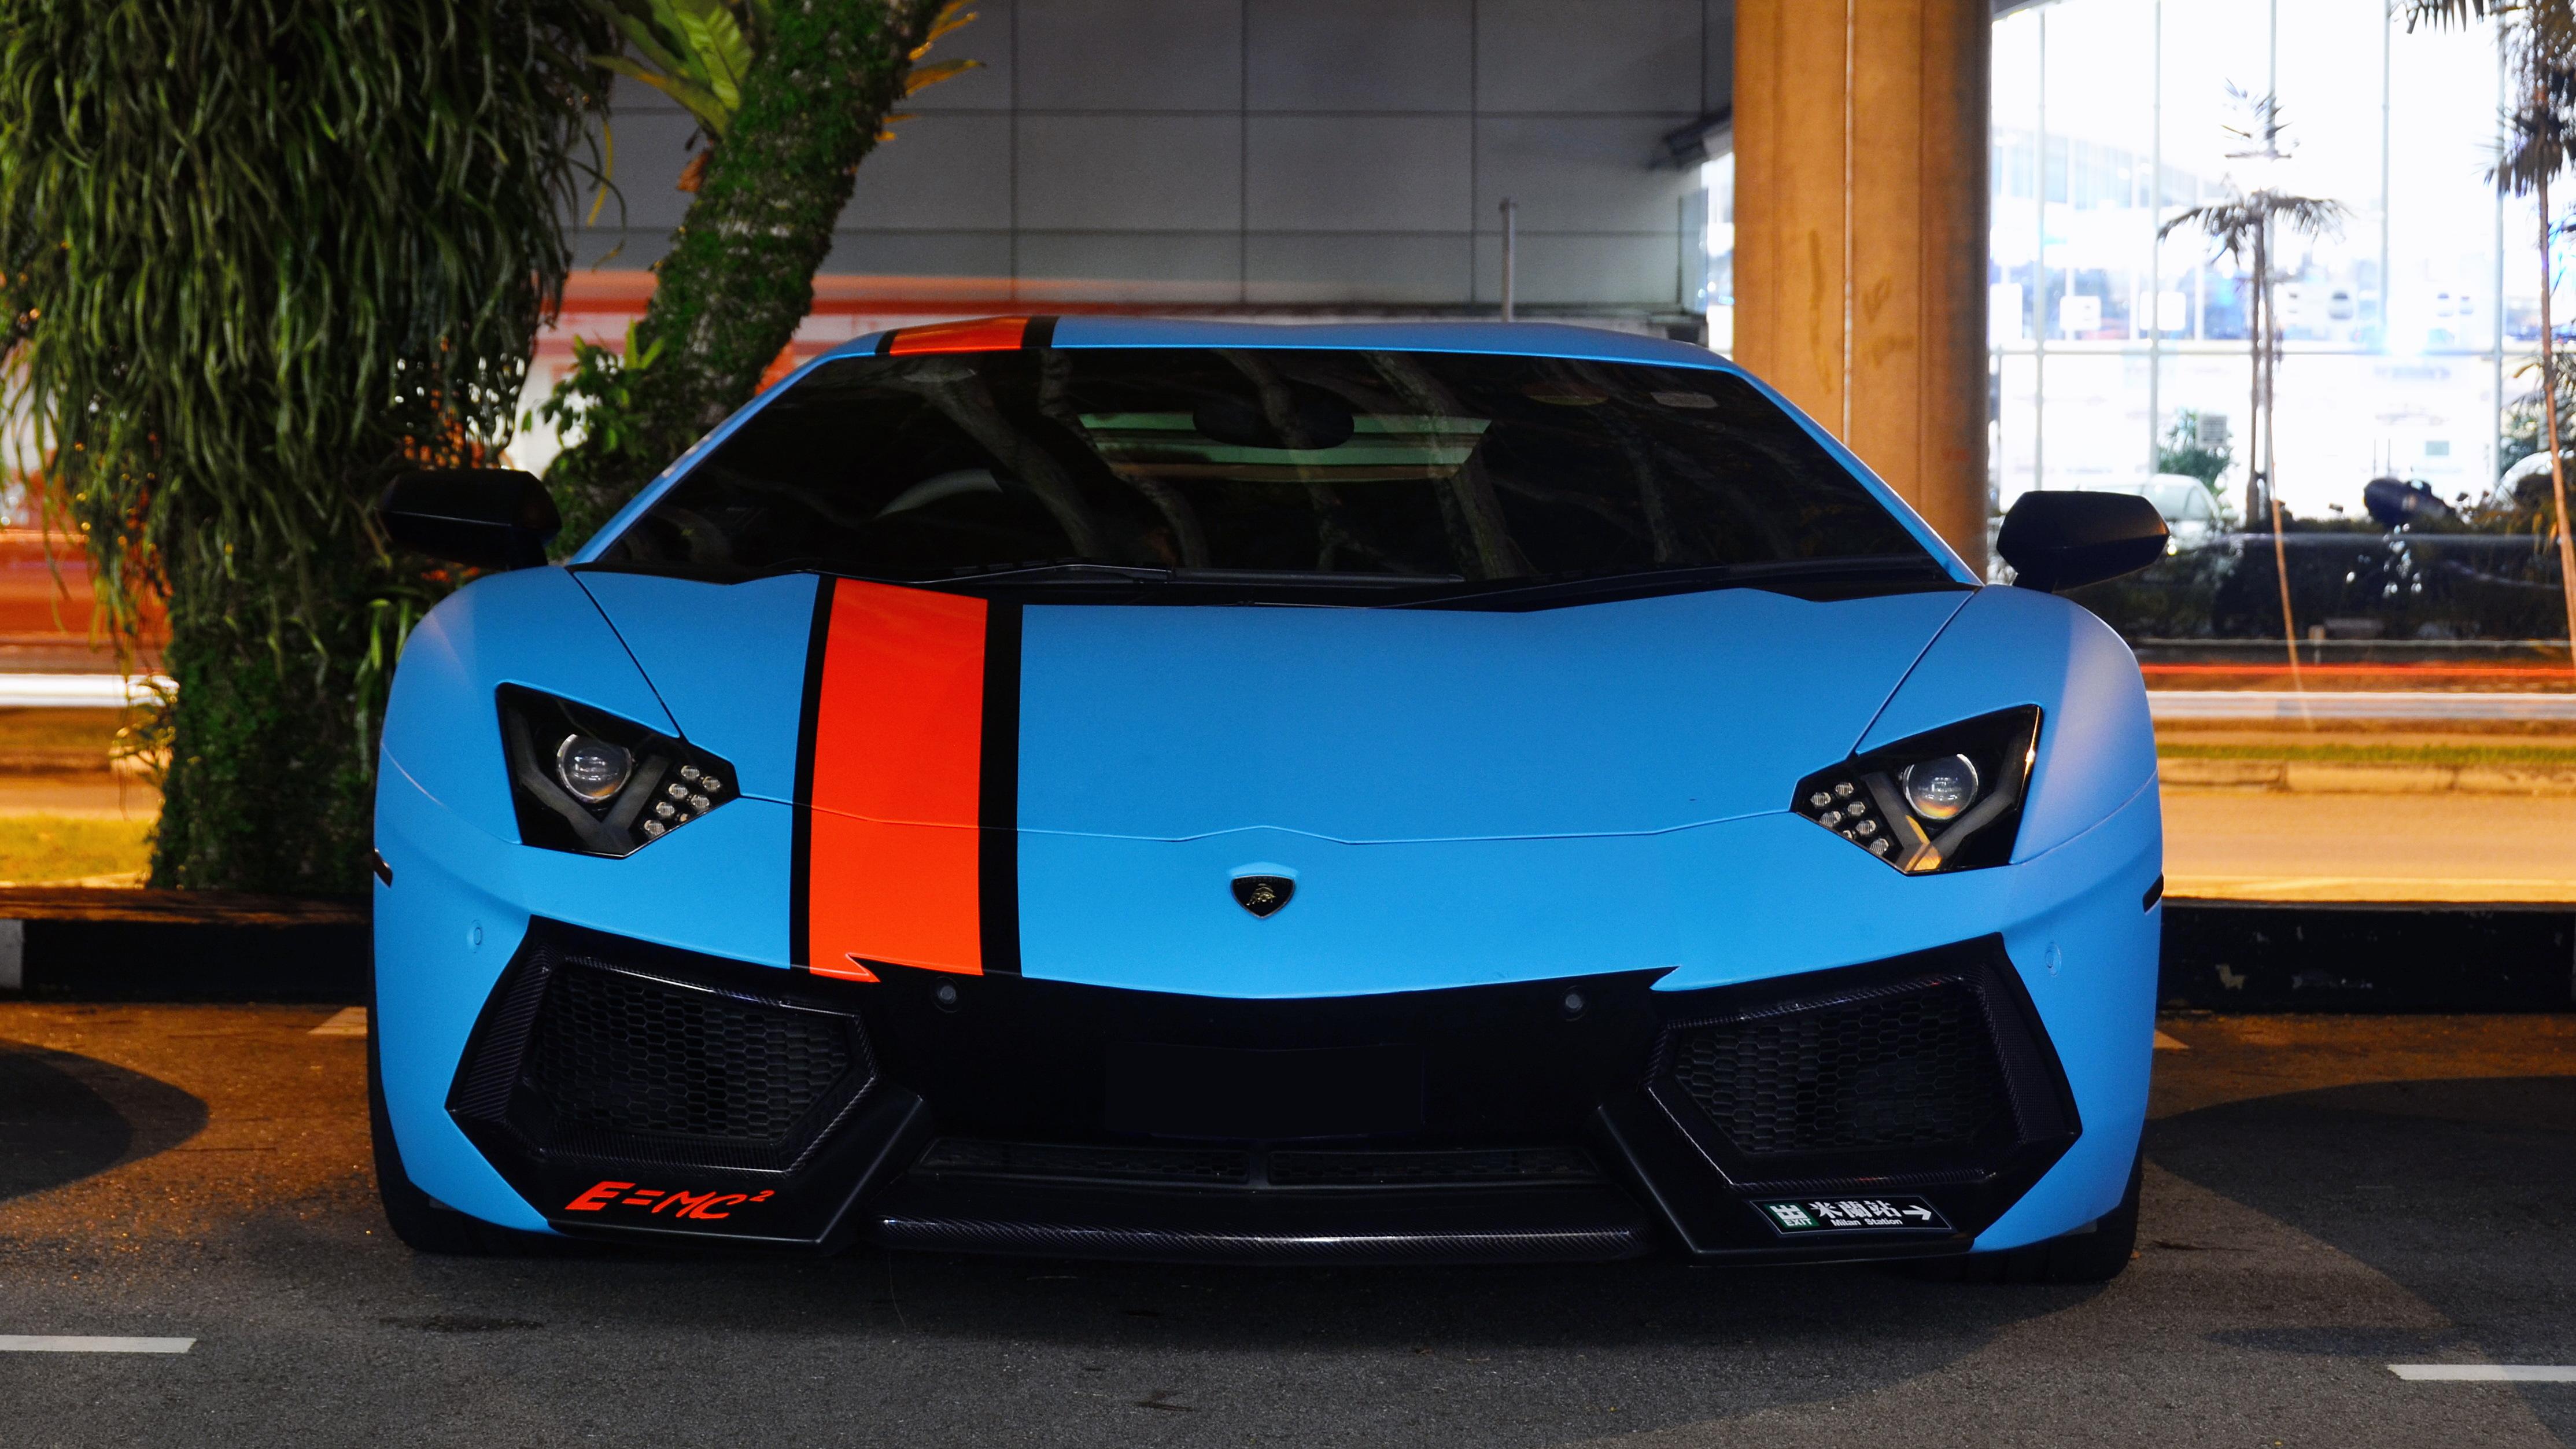 Wallpaper Supercars Blue Lamborghini Aventador Sports Car